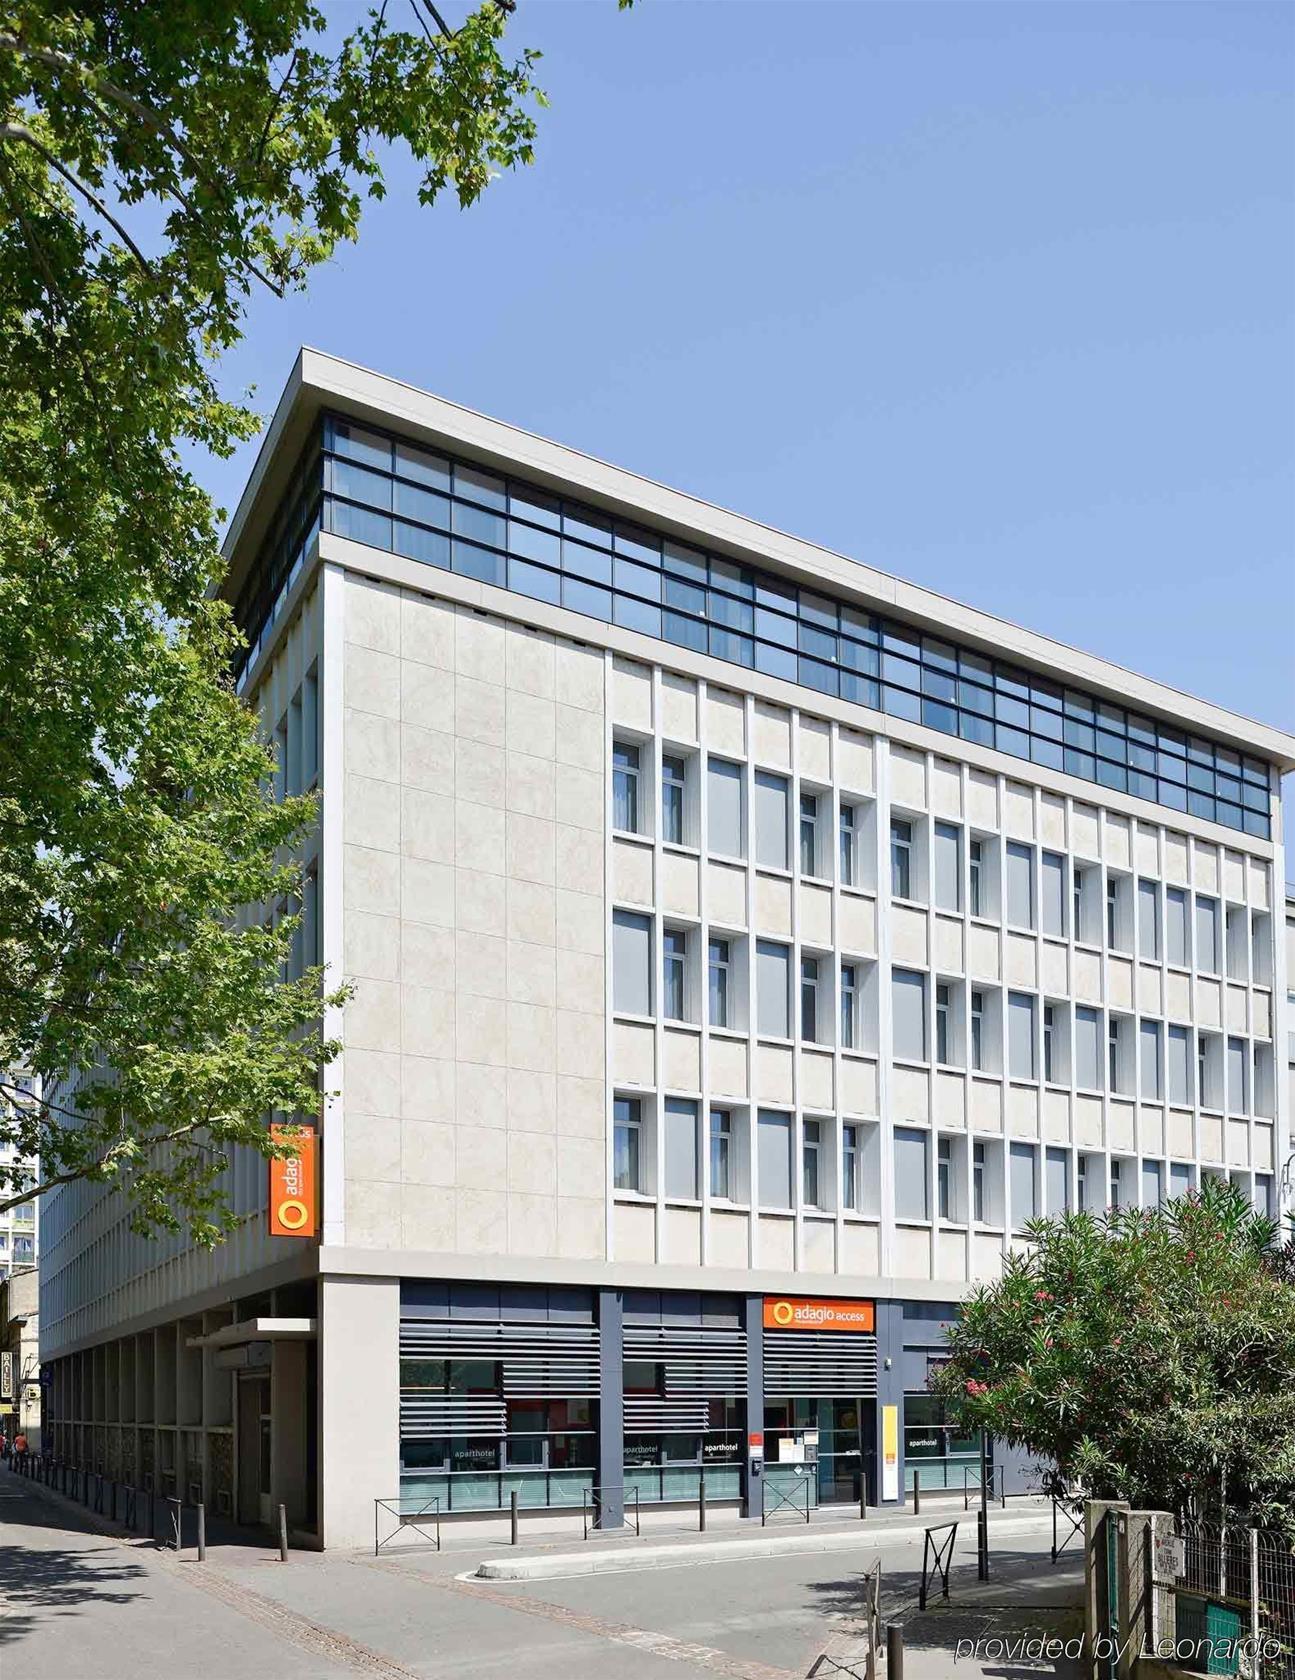 Trenes barcelona toulouse desde 64 ofertas de billetes for Aparthotel adagio espagne